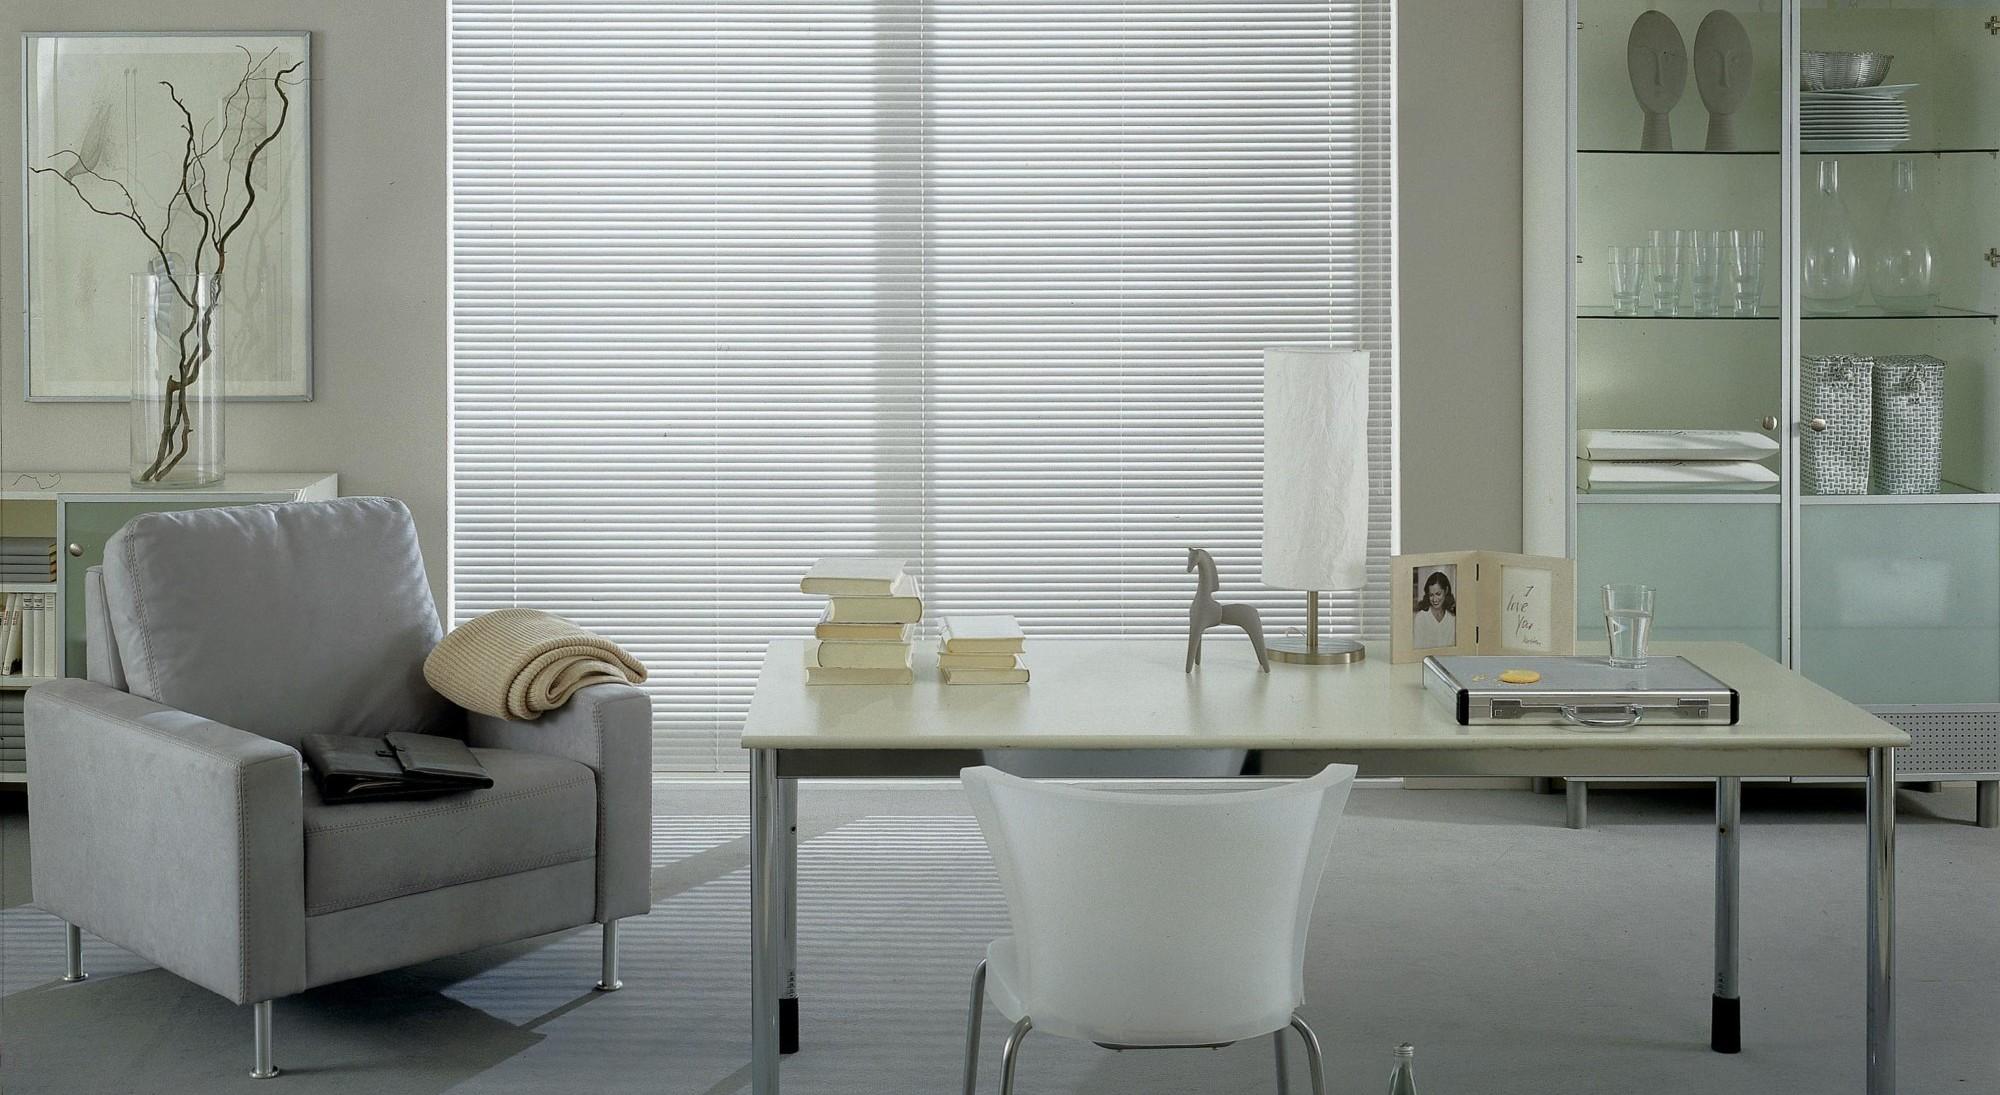 jellinghaus raumgestaltung sonnenschutz gmbh. Black Bedroom Furniture Sets. Home Design Ideas